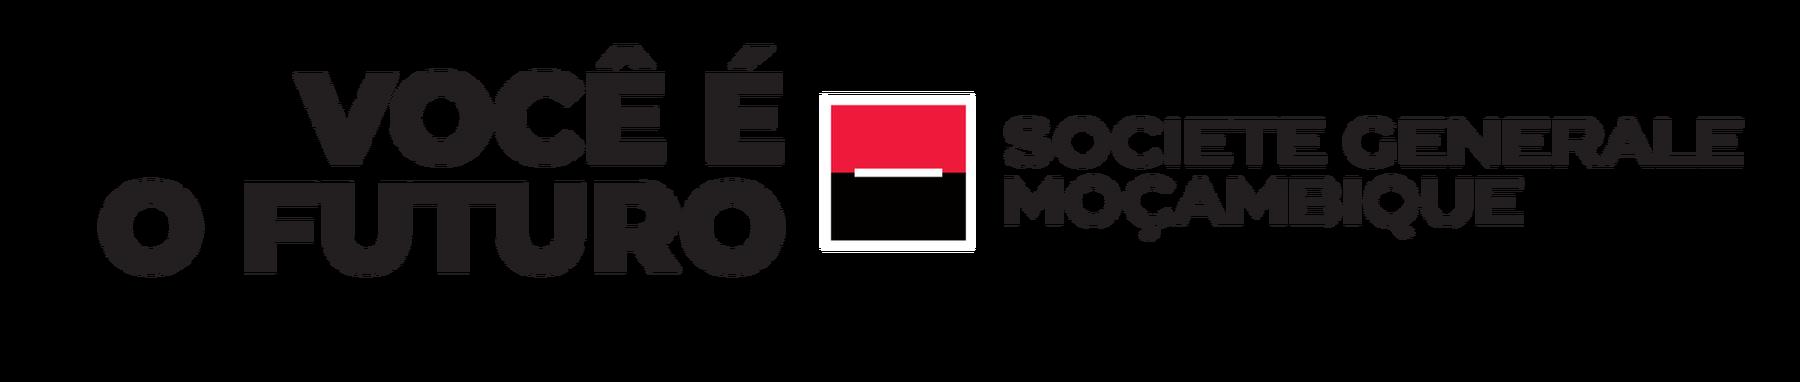 Logo societe generale pt